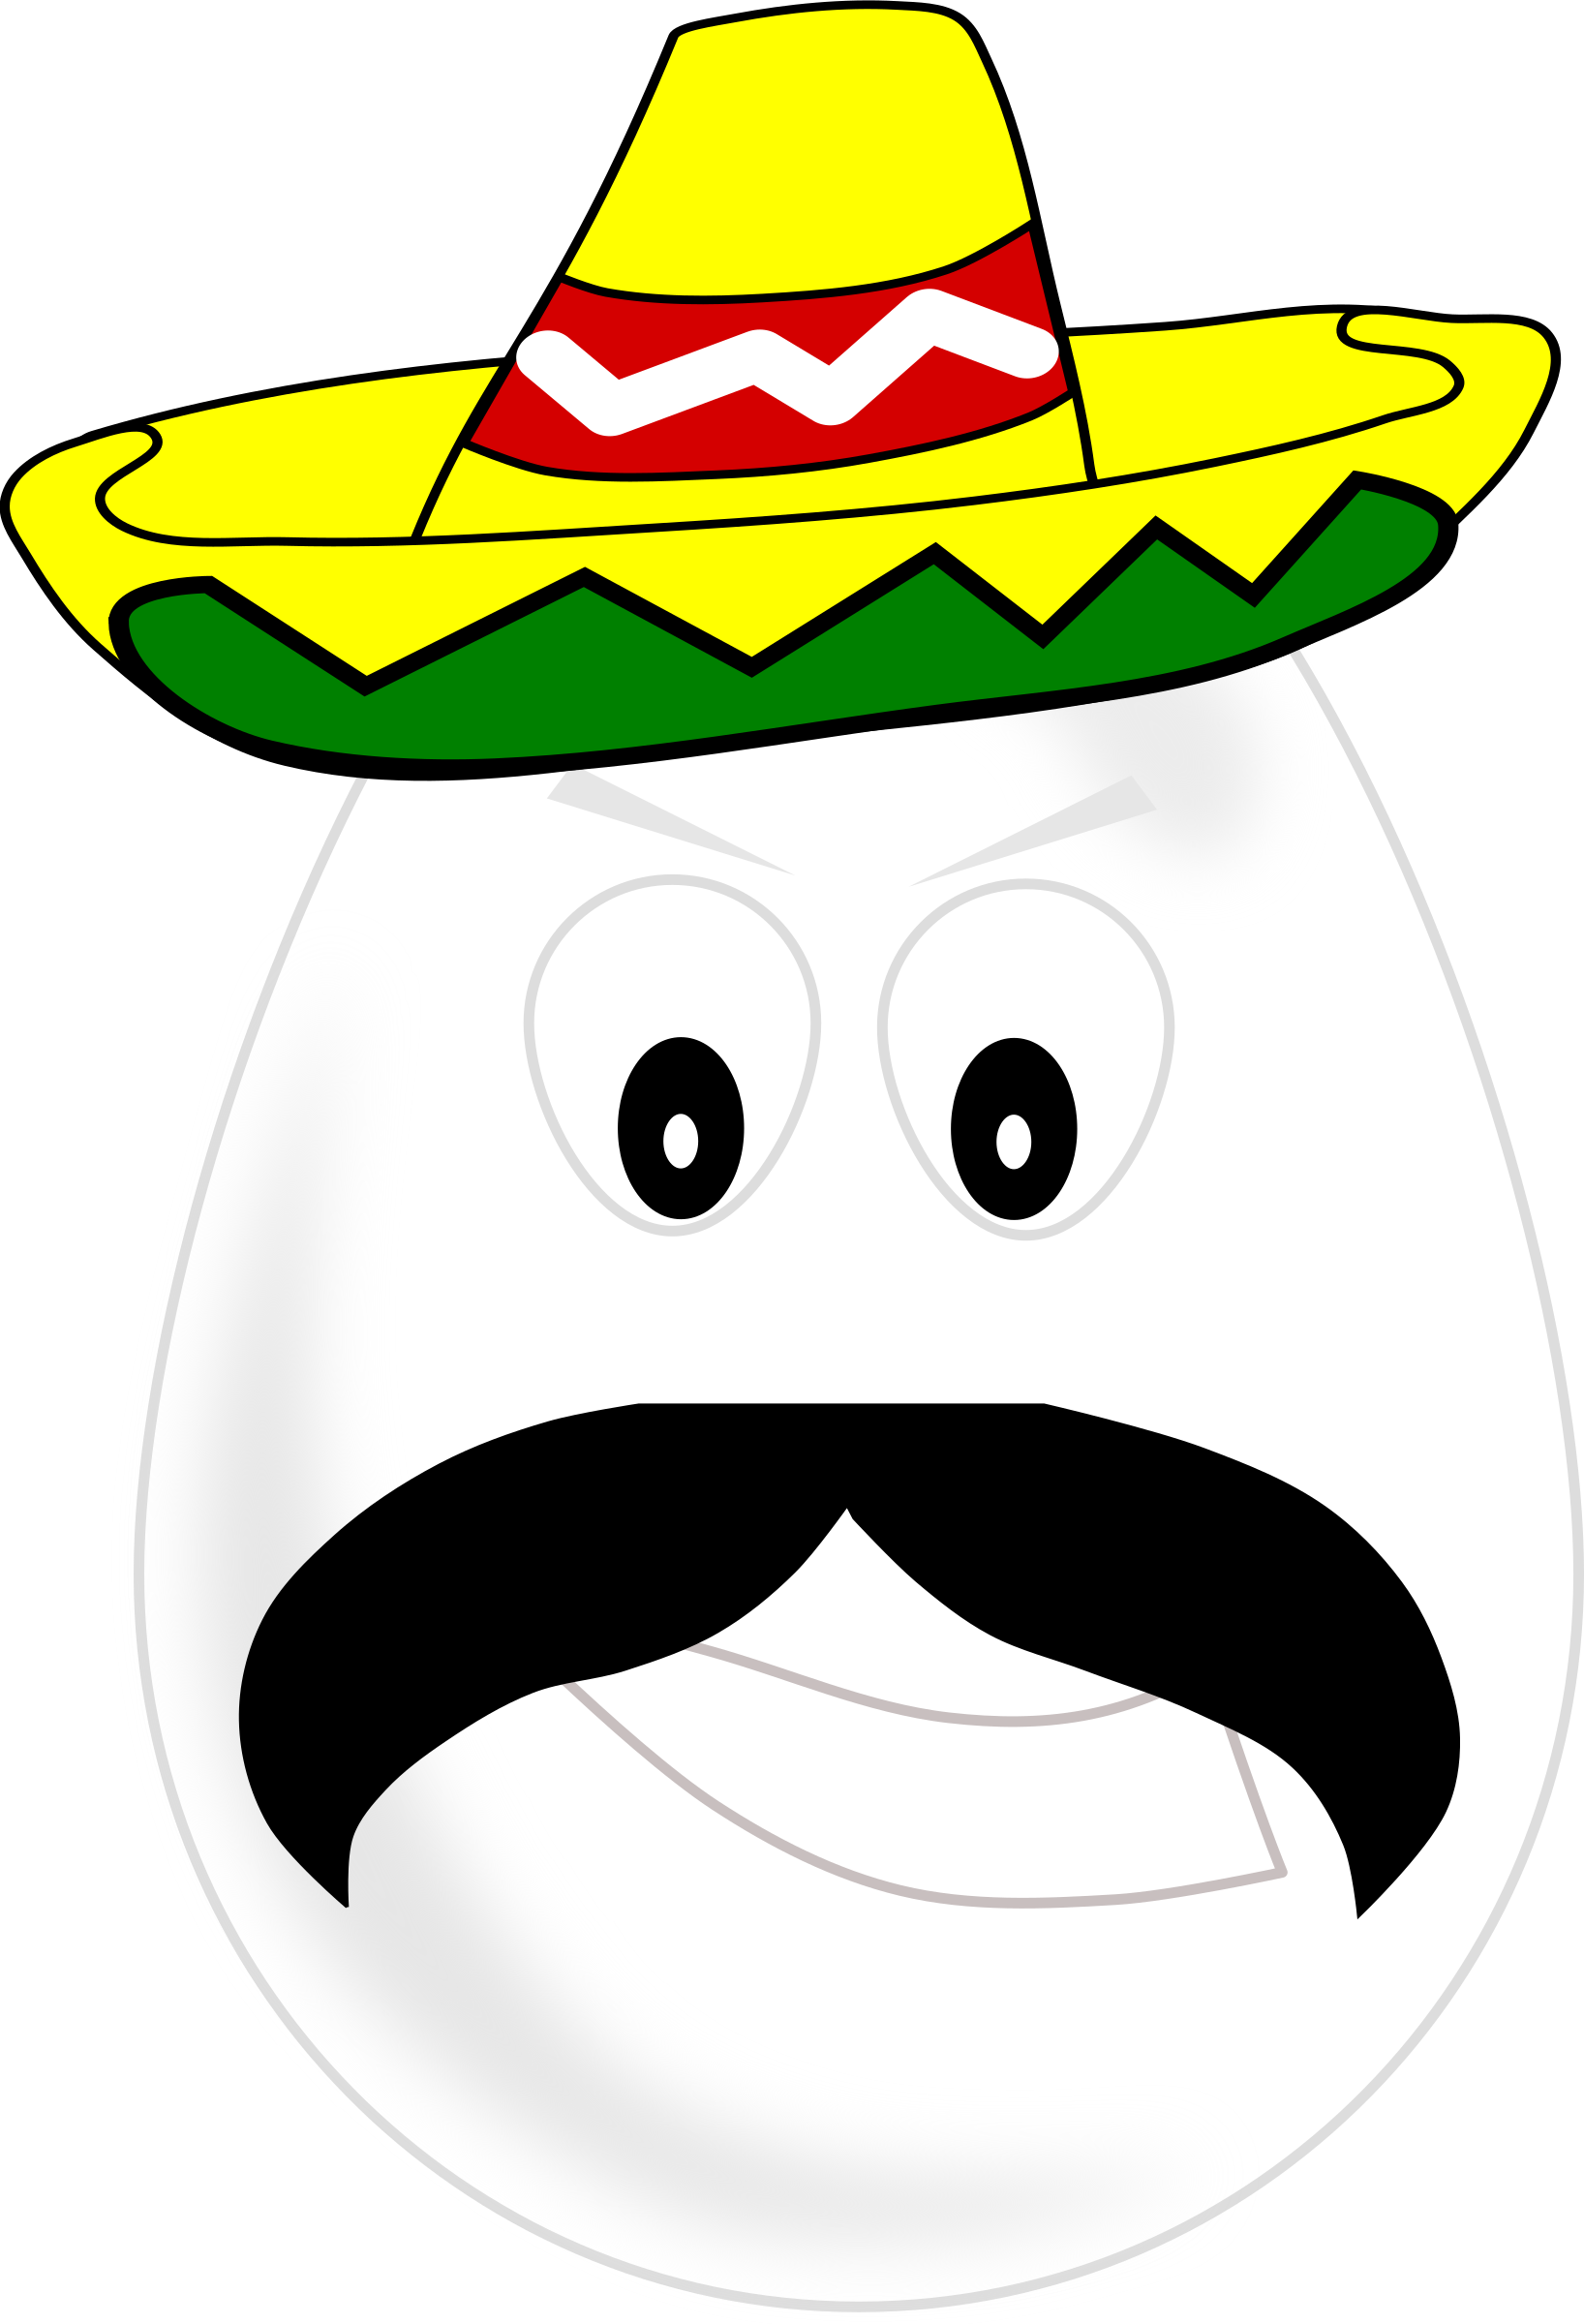 Mexican egg big image. Moustache clipart sombrero